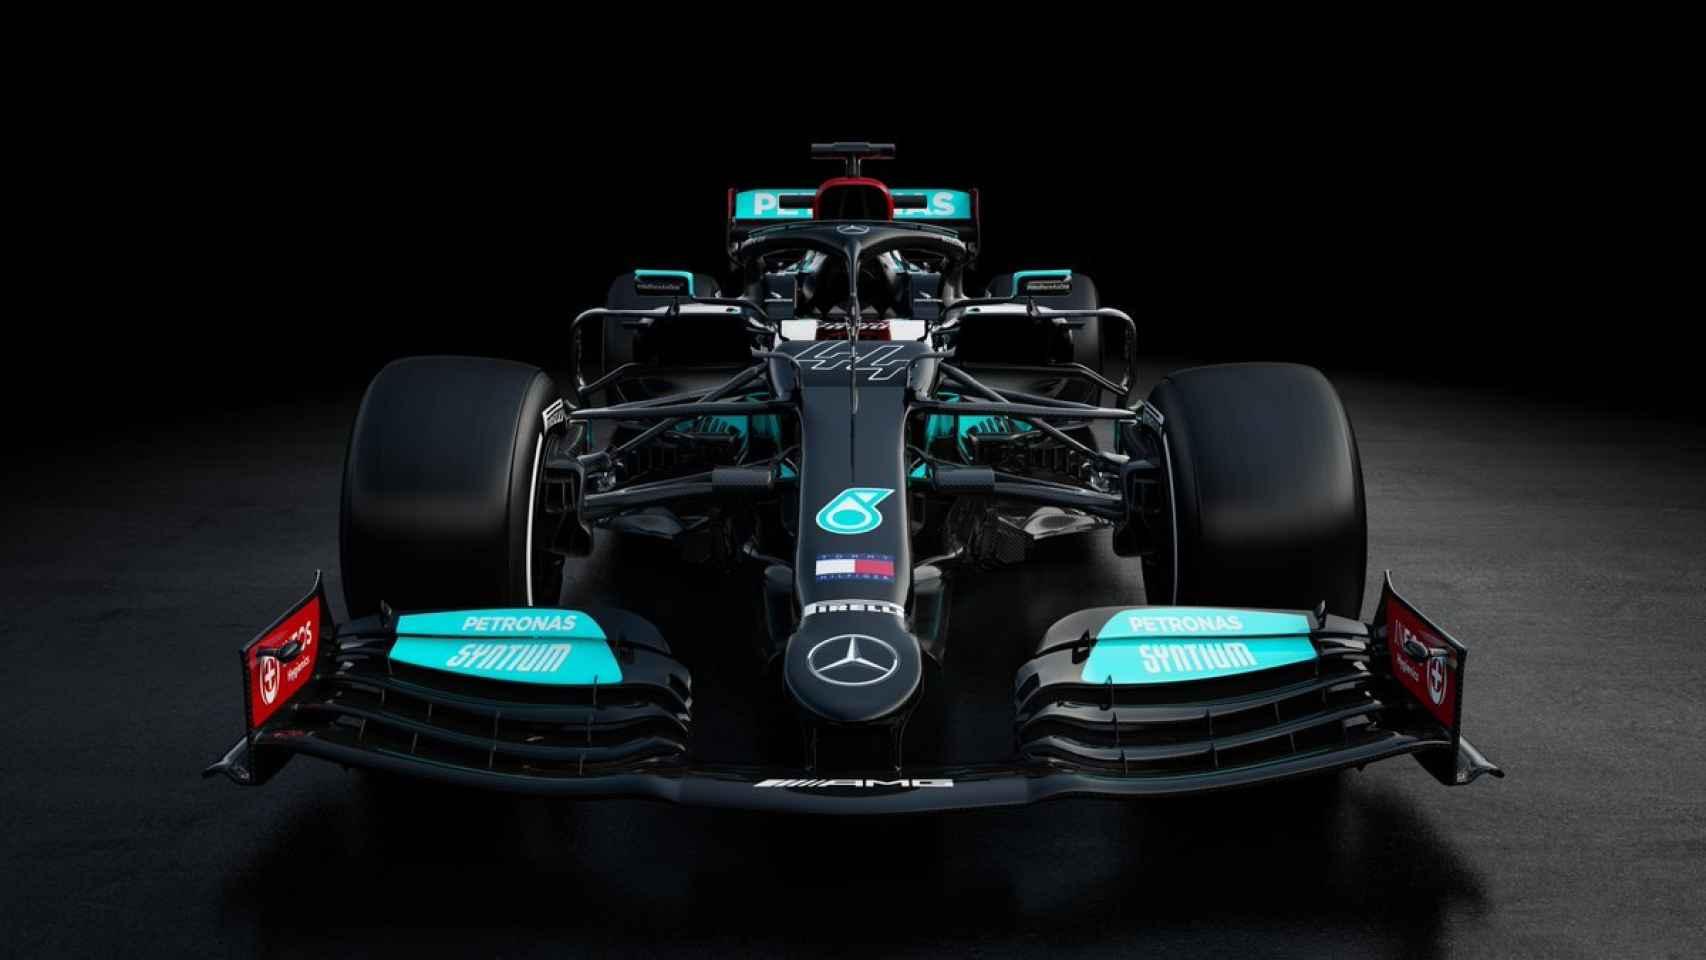 Mercedes presenta el W12 para la temporada 2021 de Fórmula 1